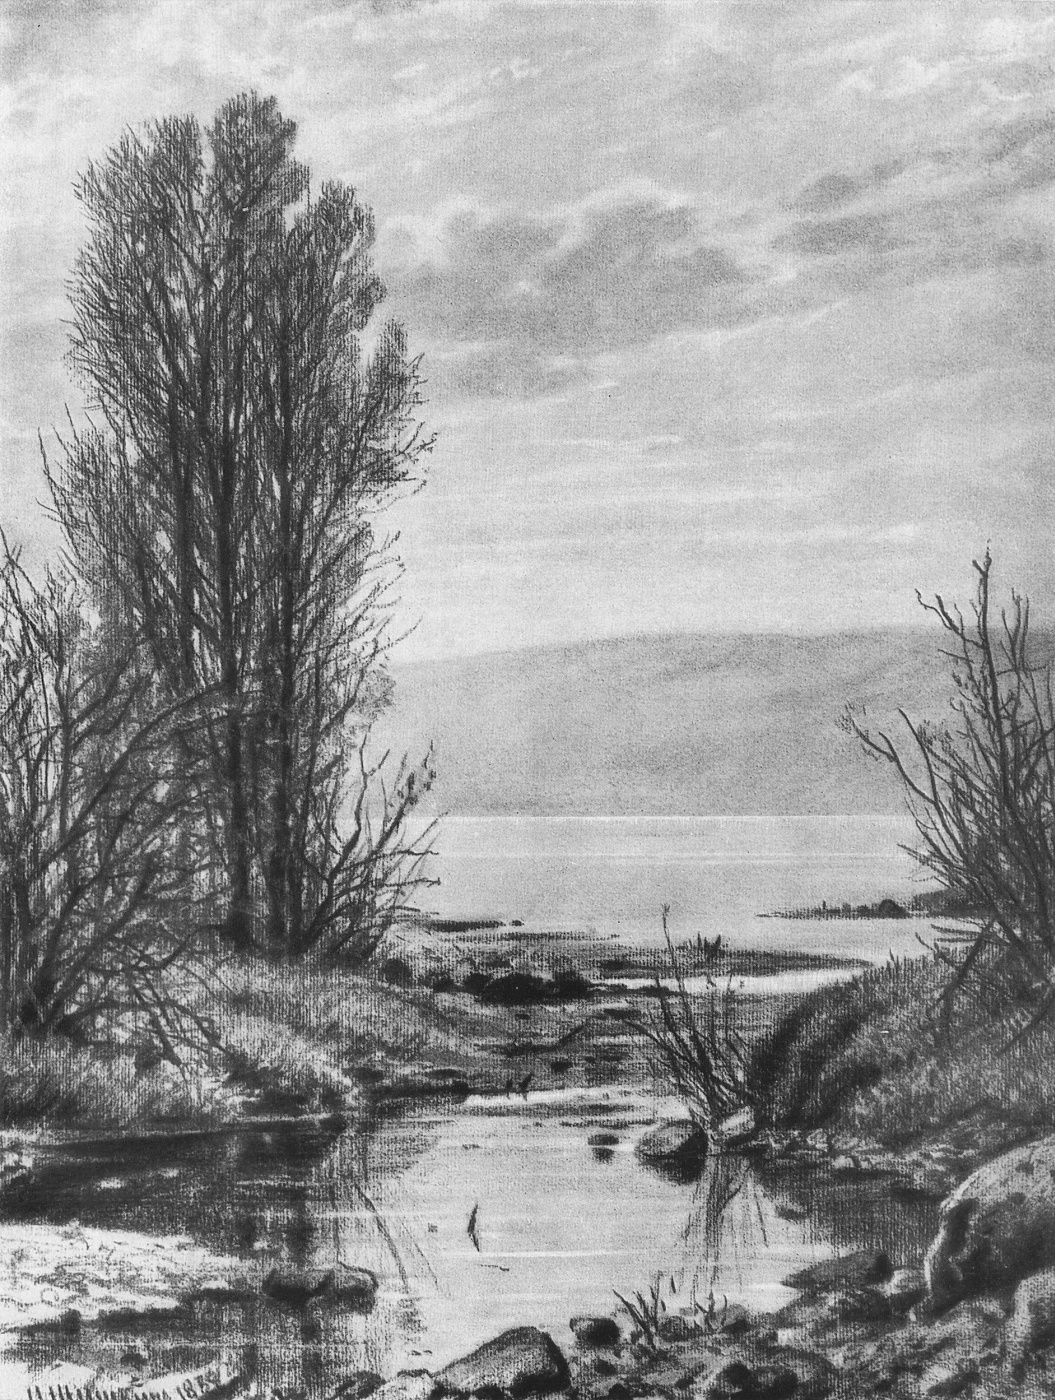 Ivan Shishkin. The shore of the lake